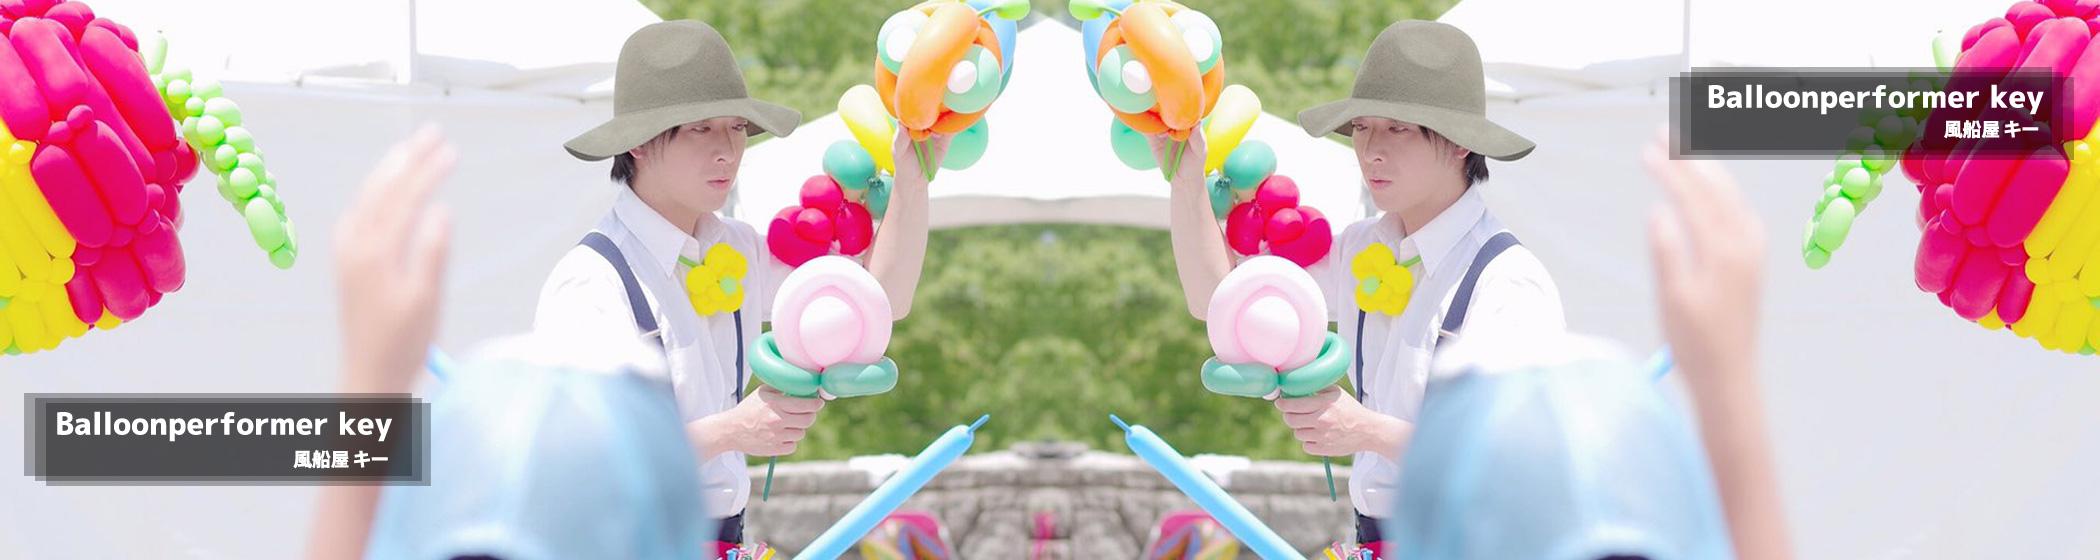 balloonperformer-key1